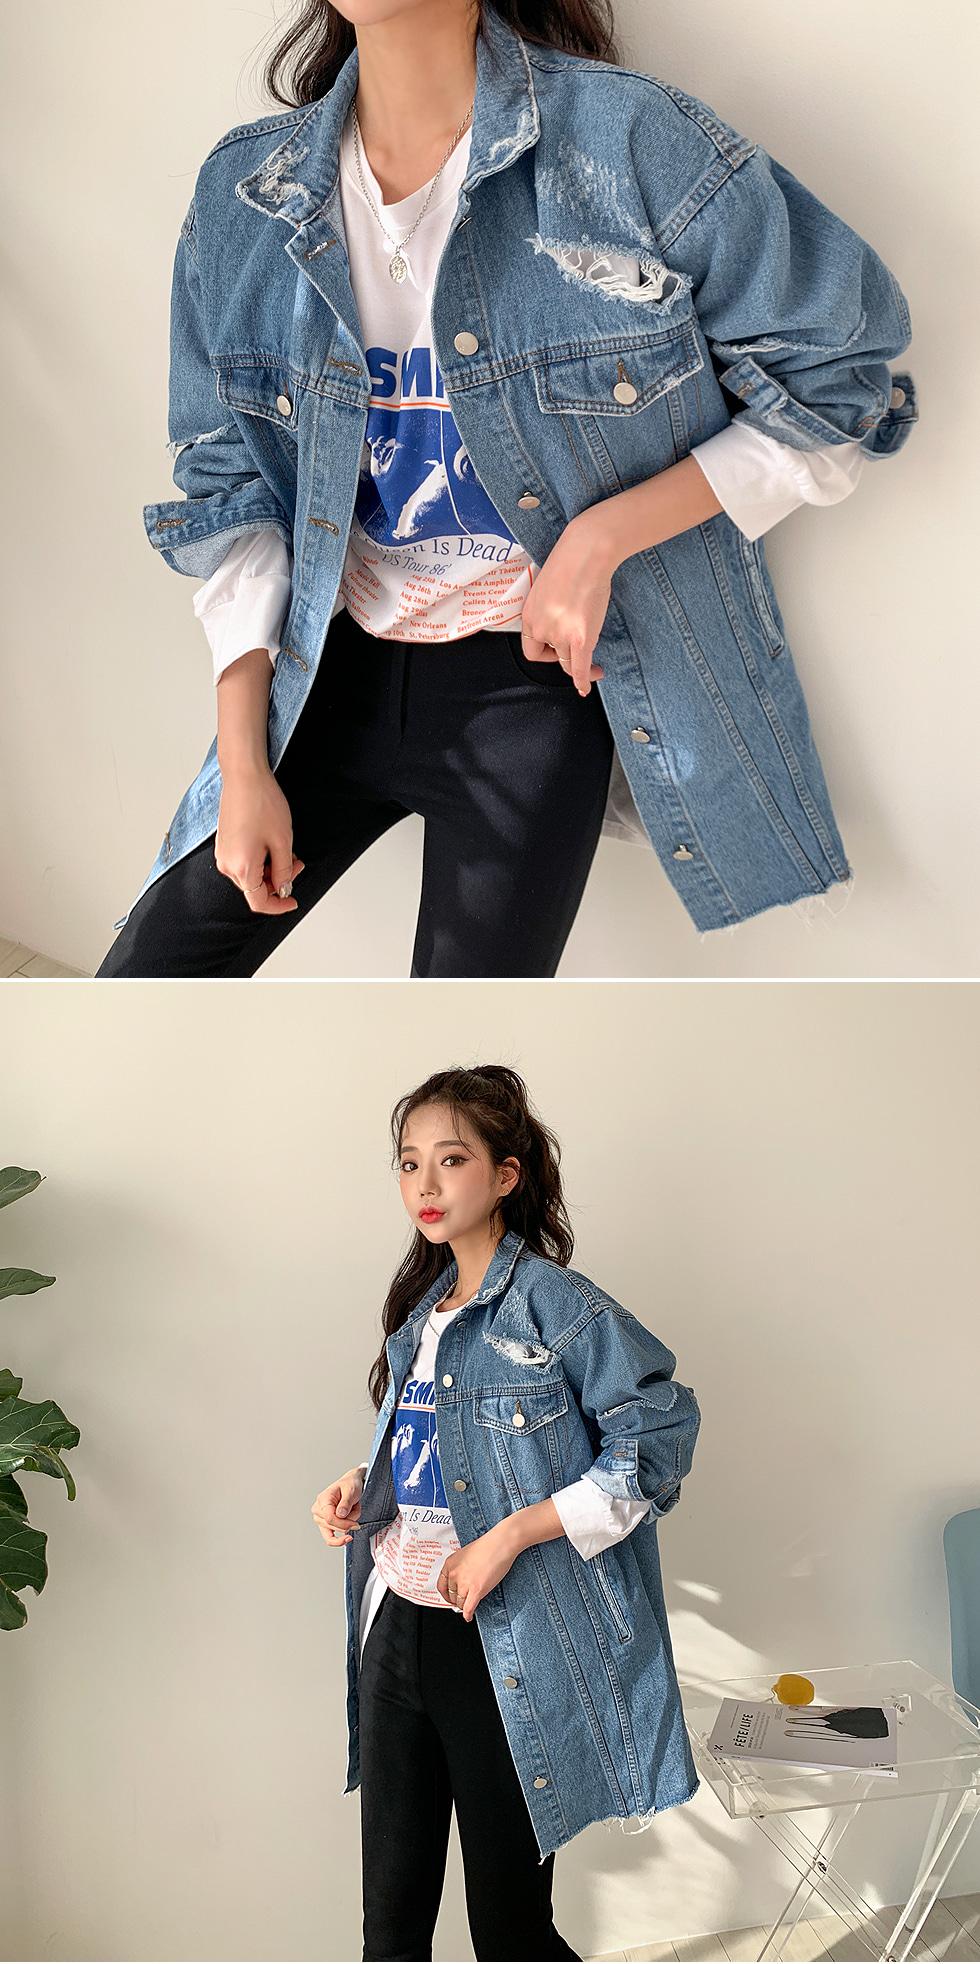 With Vintage Blue Jacket